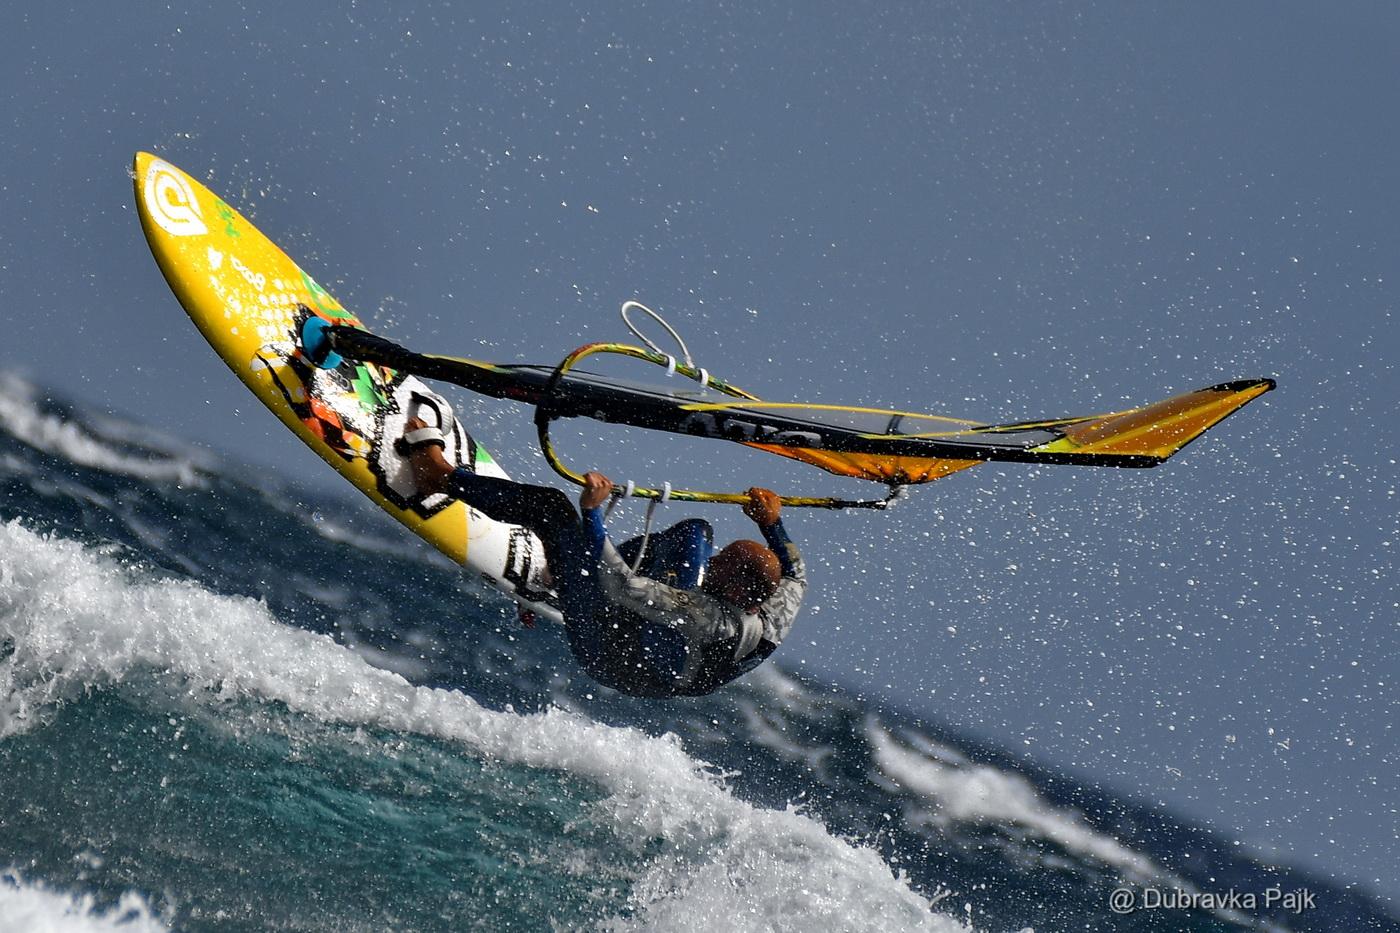 Freestyle Windsurfing – El Medano, Tenerife, Canary Islands, February 2020